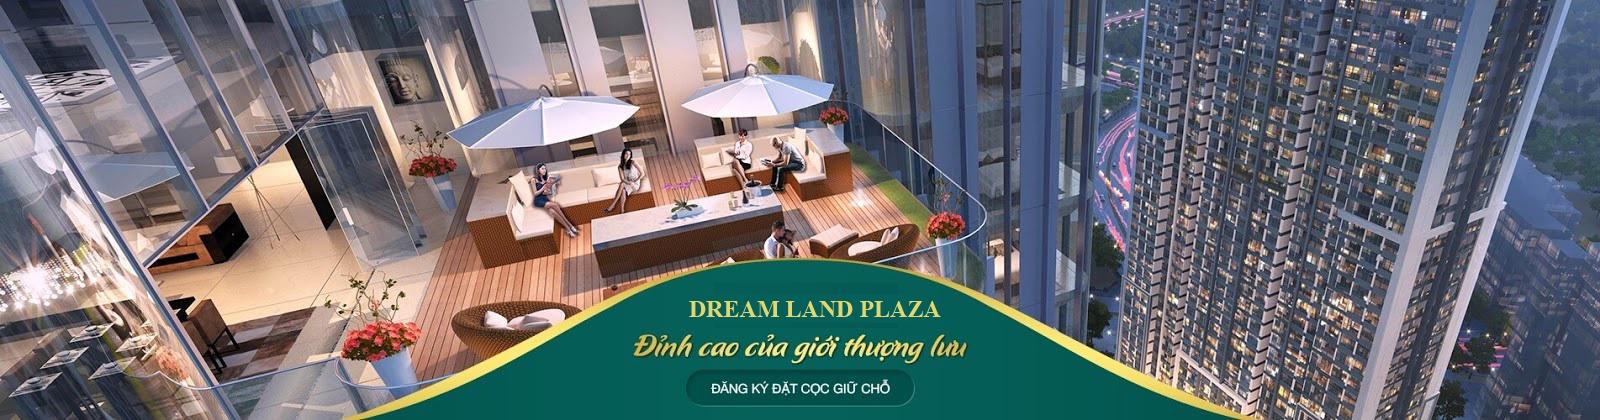 slider_bg_plane_Chung cư Dream Land Plaza 23 Duy Tân